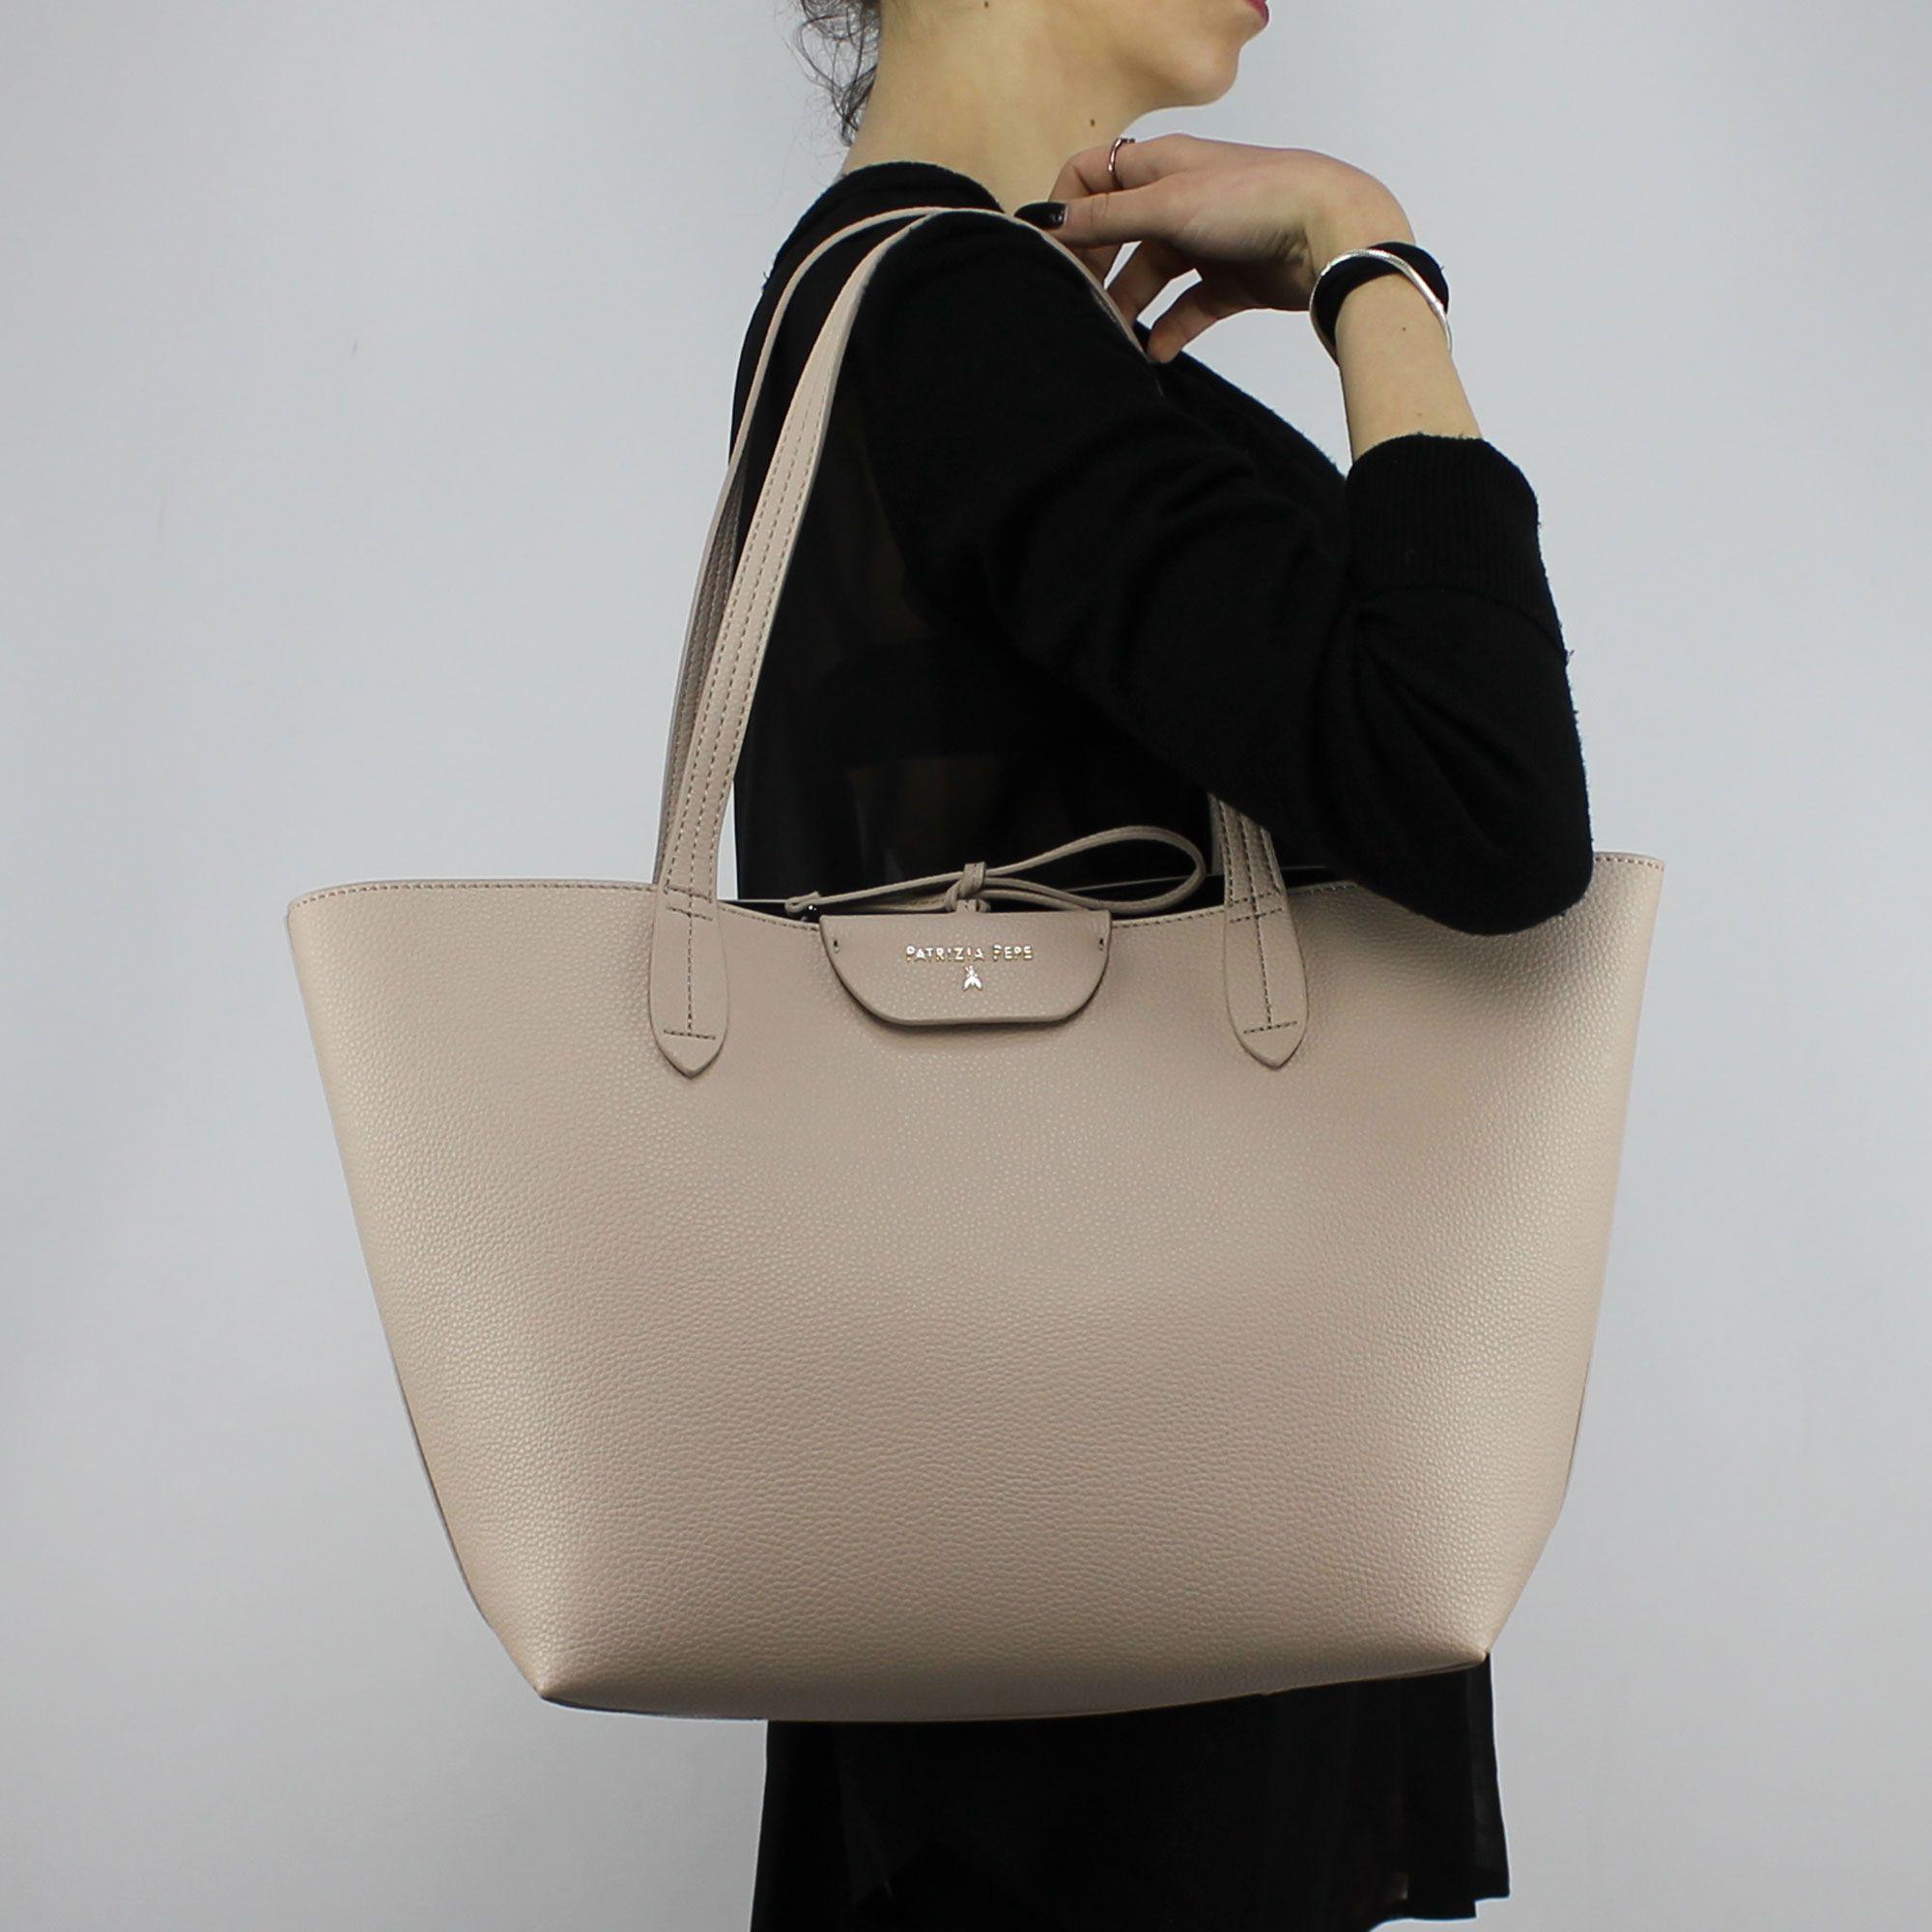 get online cheap prices price reduced Sac Shopping réversible Patrizia Pepe beige et noir 2V5452 AV63